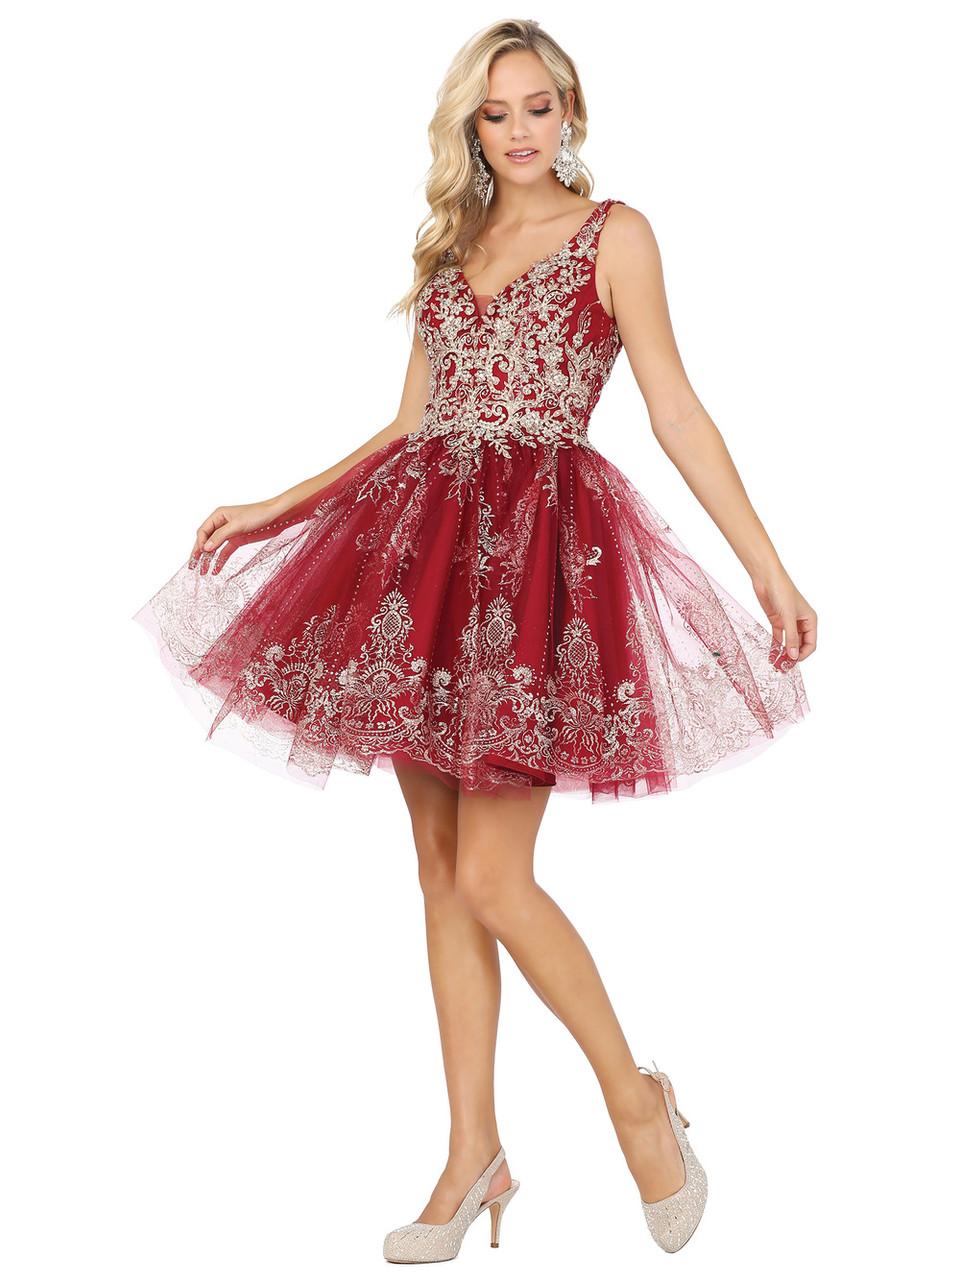 Dancing Queen 3237 Sleeveless V Neck Lace Applique Dress